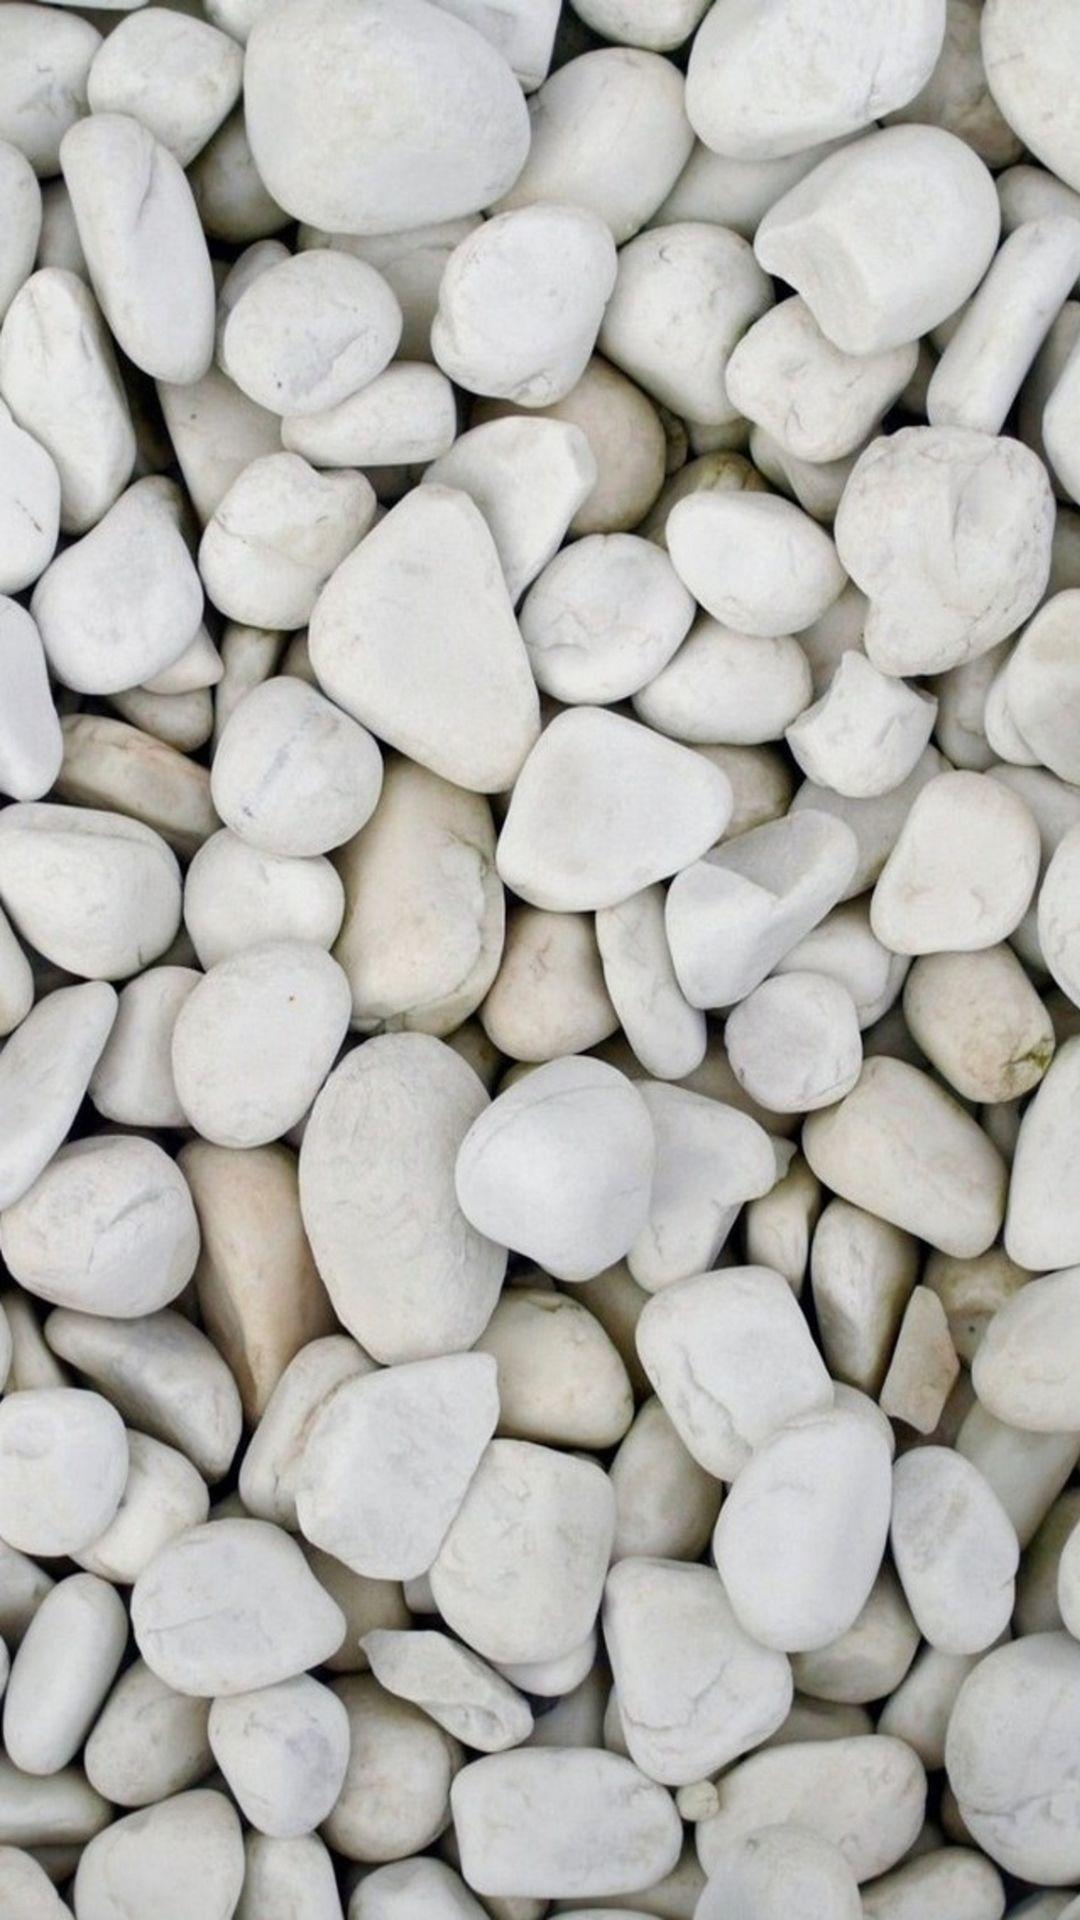 beach white pebble rock clitter background iphone  wallpaper  - beach white pebble rock clitter background iphone  wallpaper